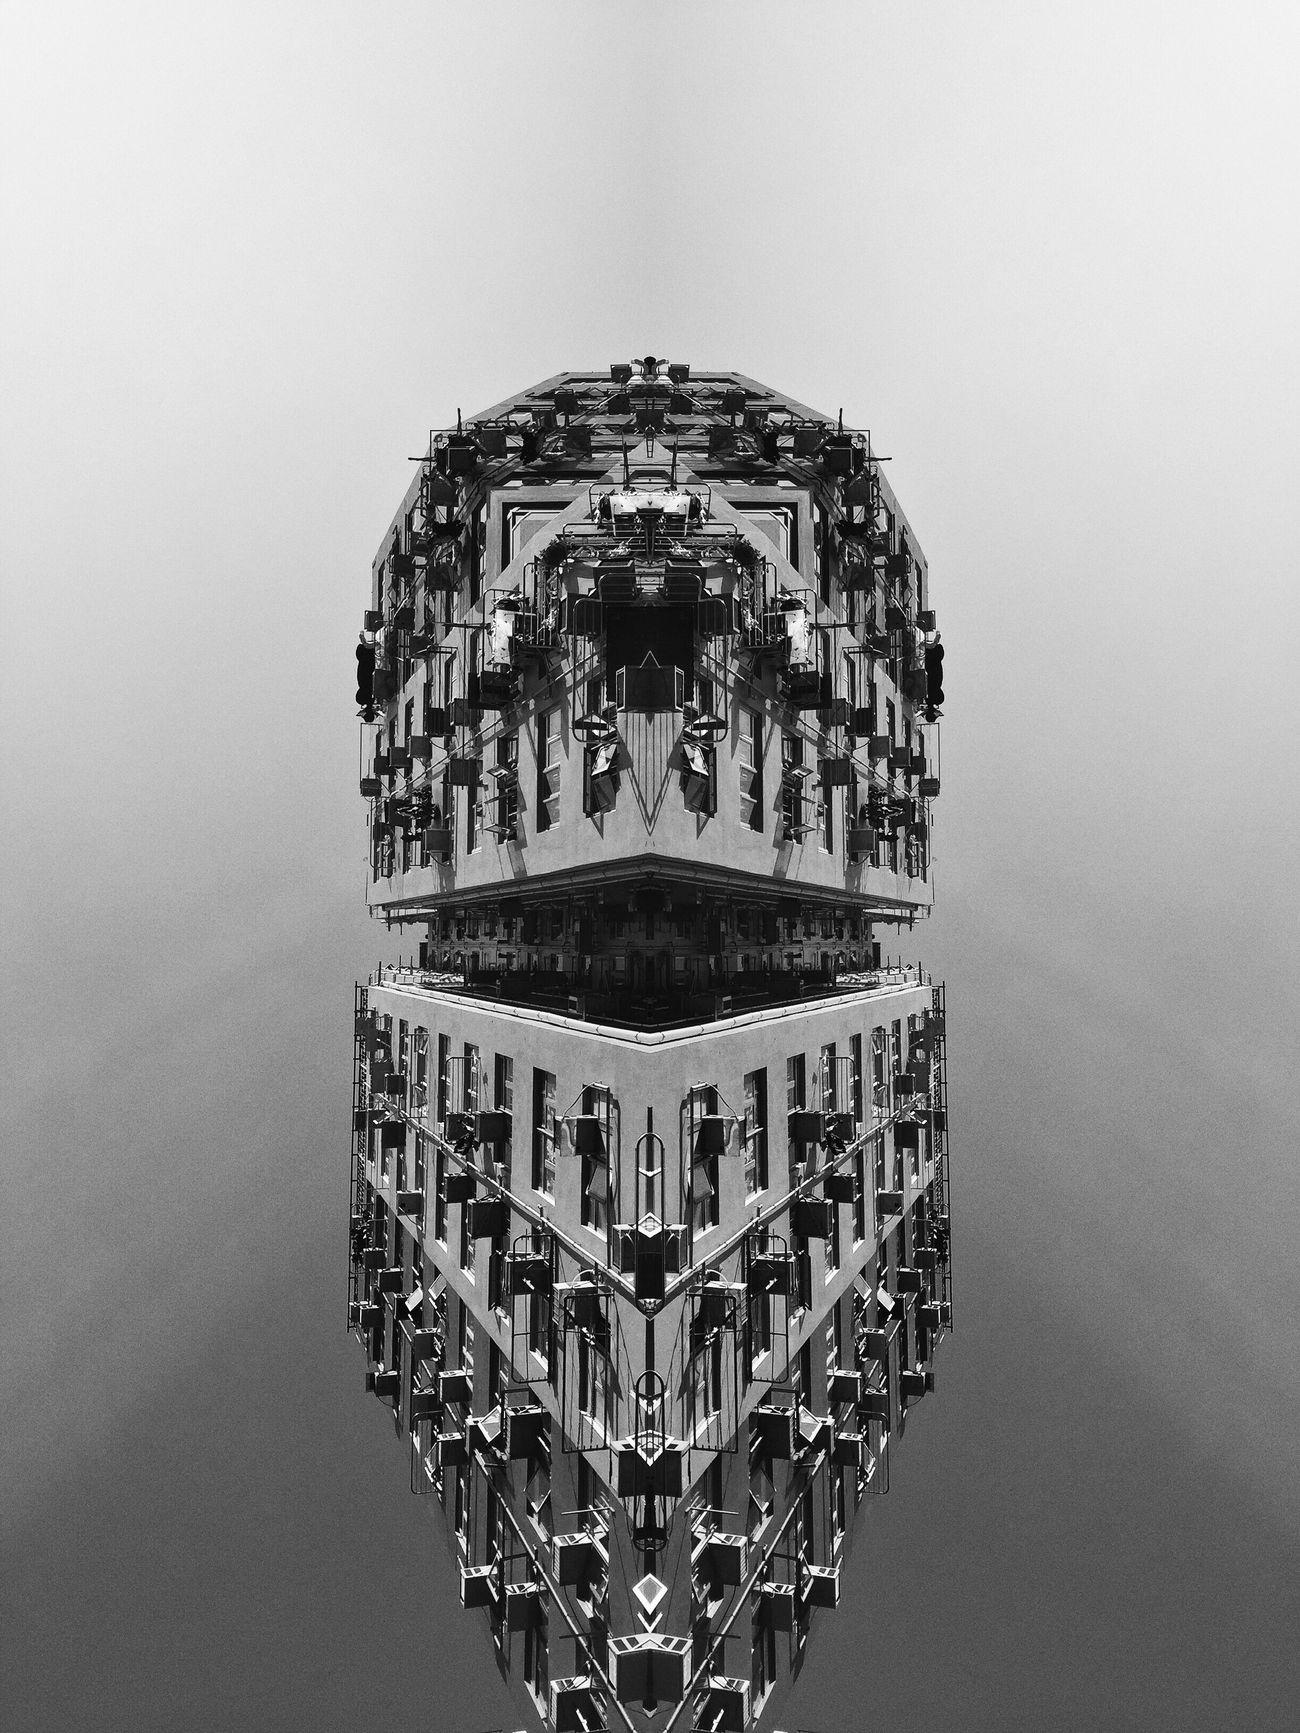 Castle neo Double Exposure Doubleexposure Abstractart Abstract Art Abstract Art Artistic Symmetry Symmetrical Symmetryporn Abstractarchitecture Rearchitseries Black And White Black & White EyeEm Best Shots - Black + White Blackandwhite Photography Blackandwhite Monochrome Monochromatic